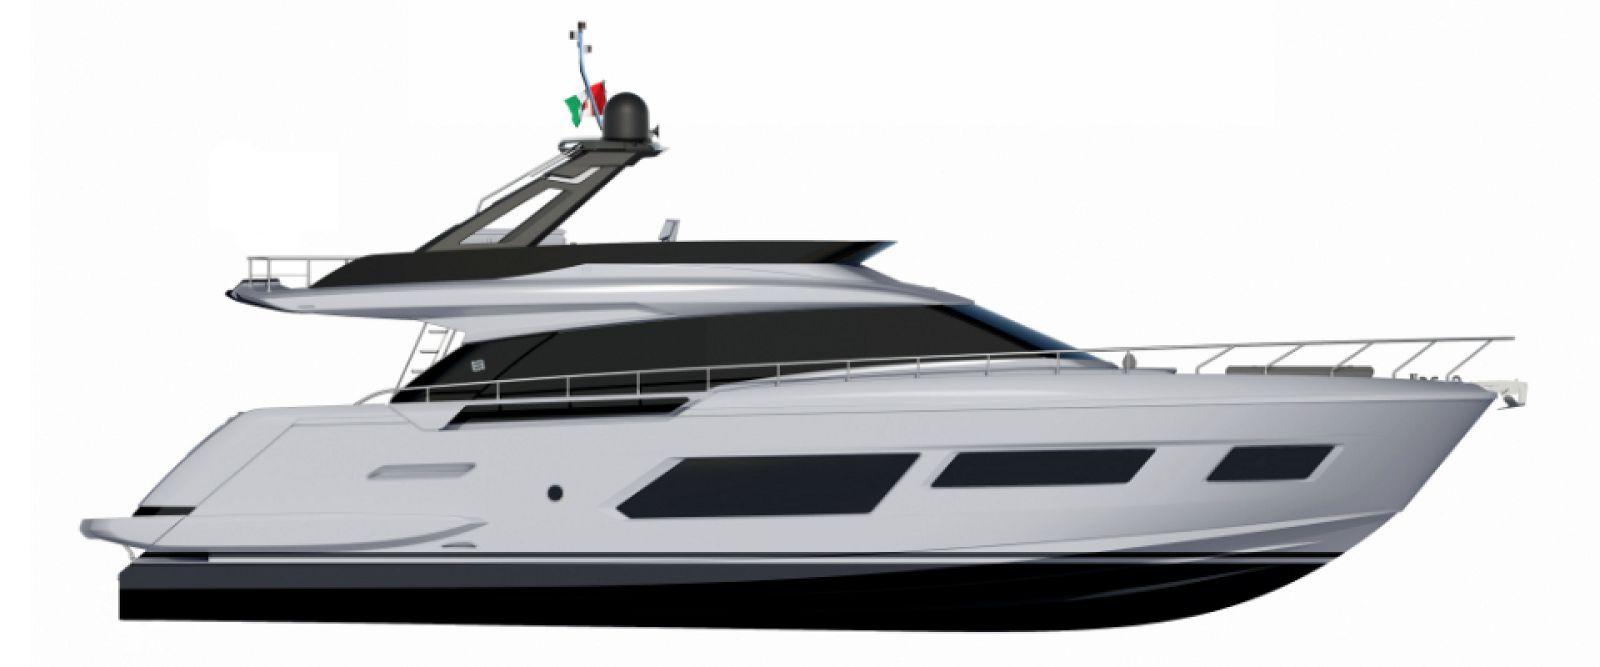 Ferretti Yachts 670 Layout - New Luxury Yacht for Sale >